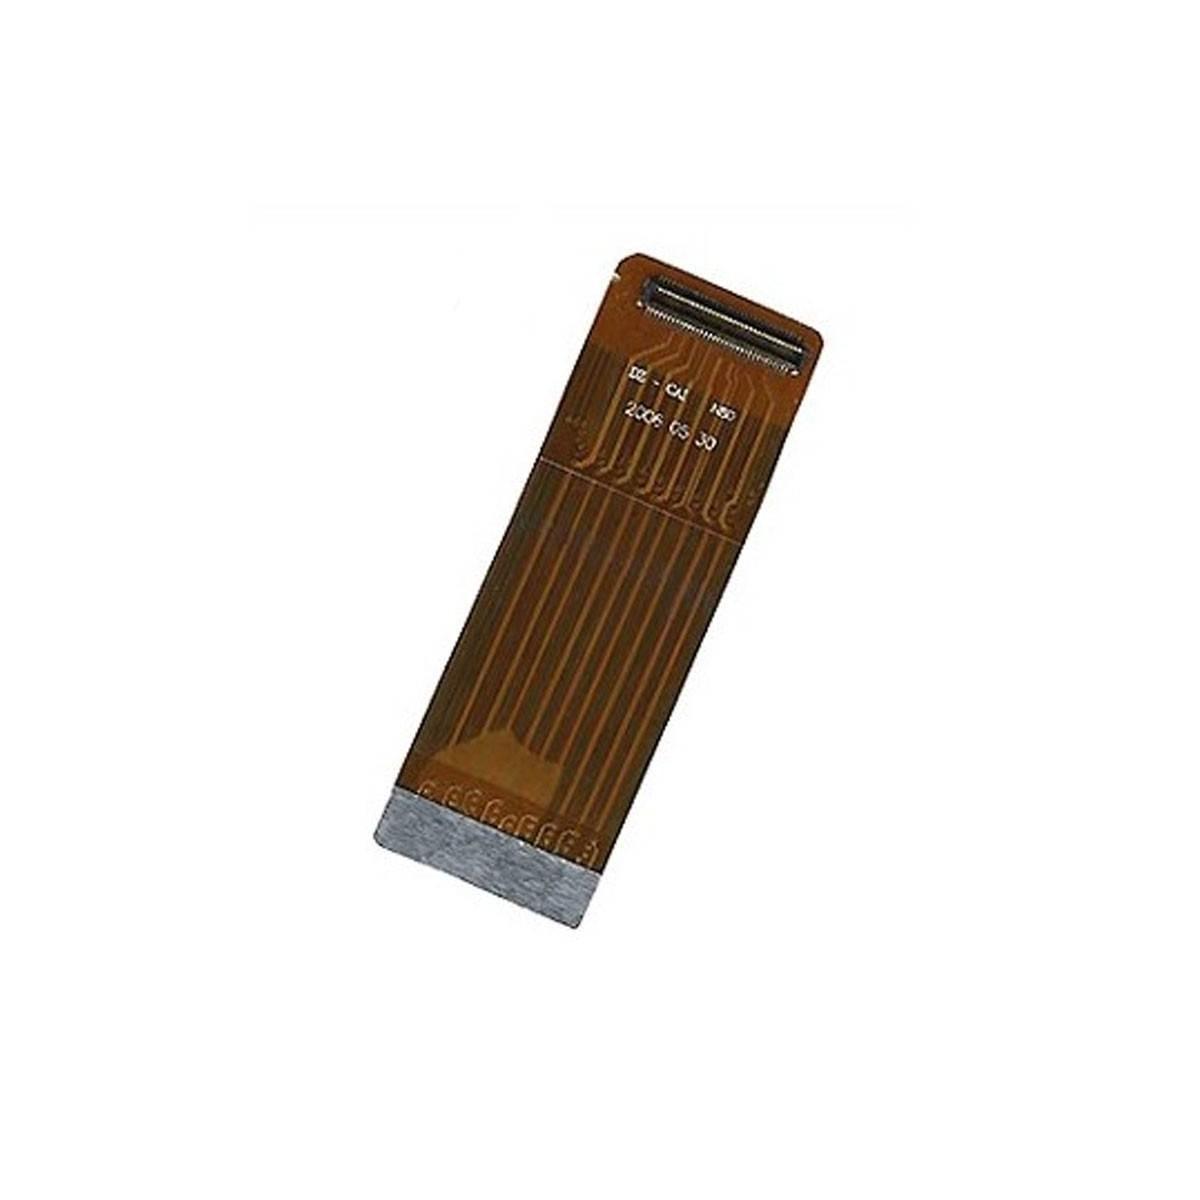 Nokia N80, cable flex